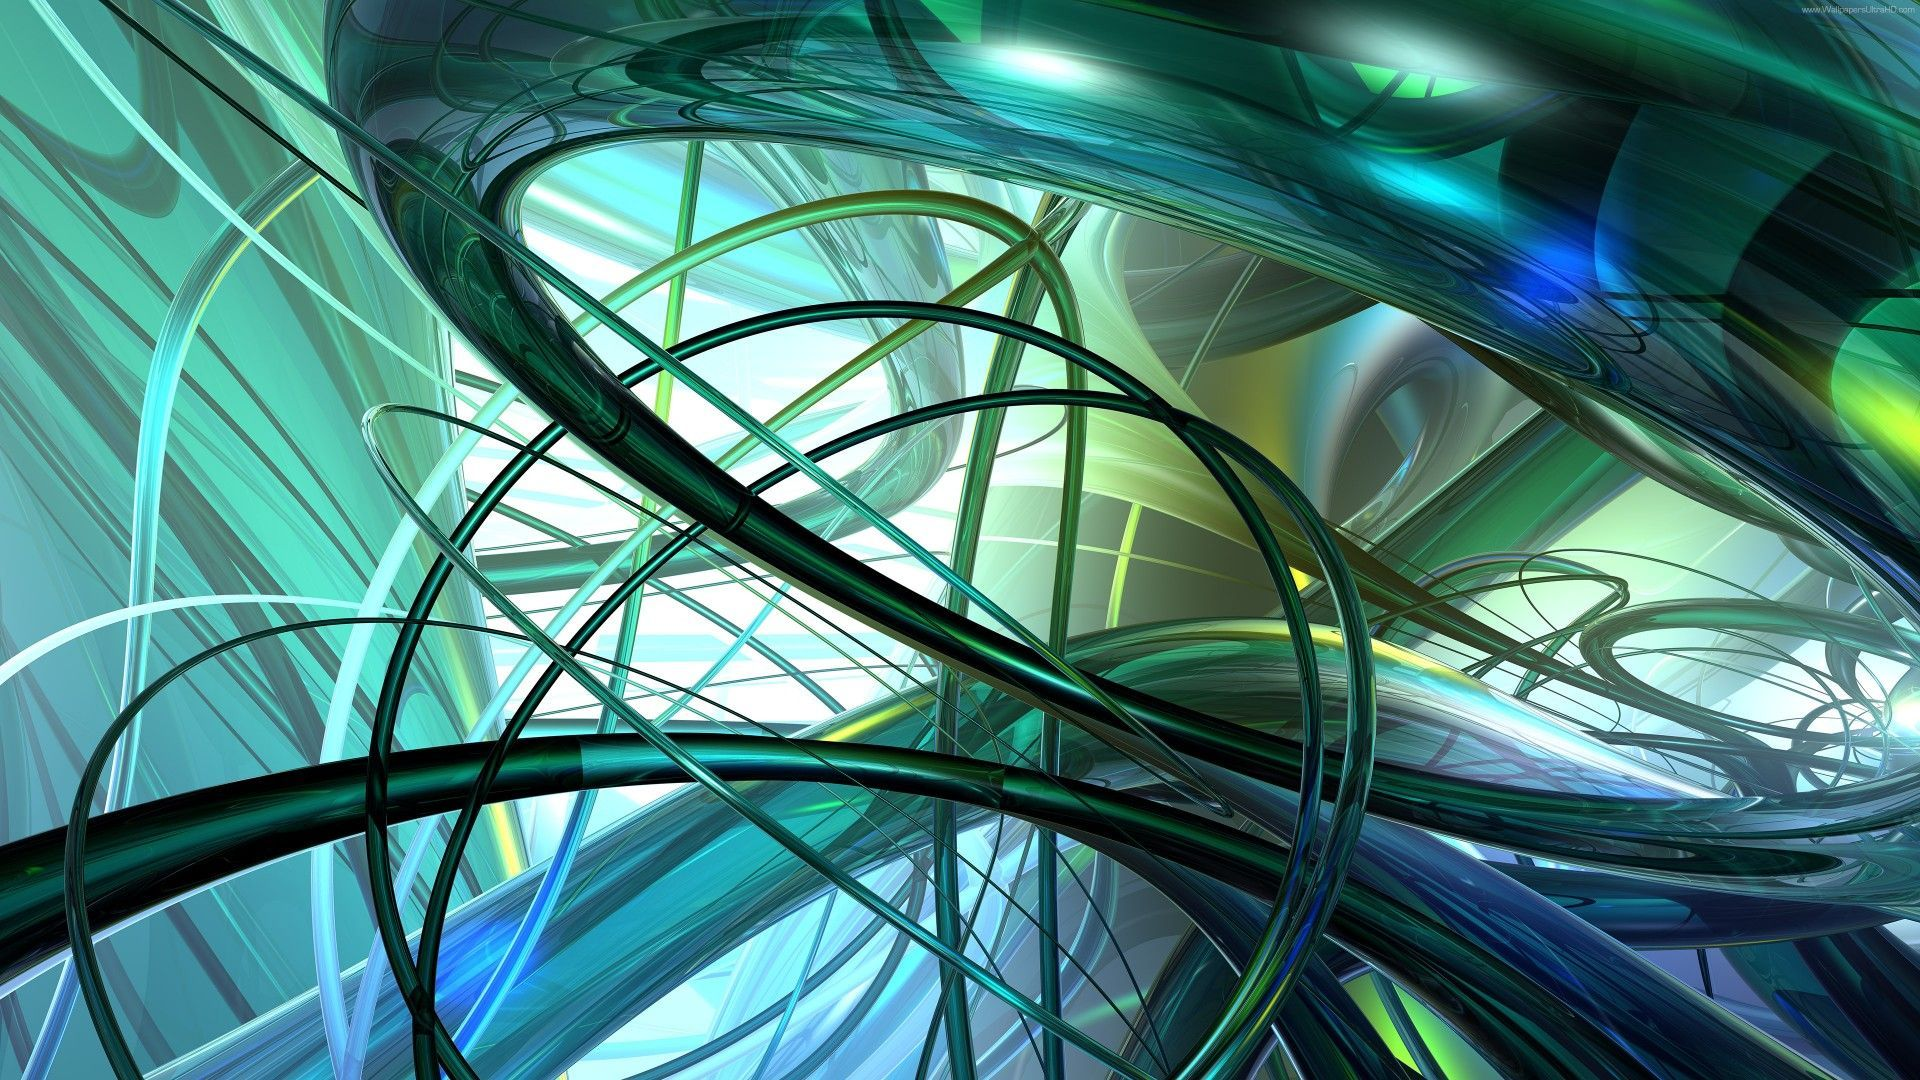 Wallpaper Desktop Abstract, Wallpapers Graphics Abstraction